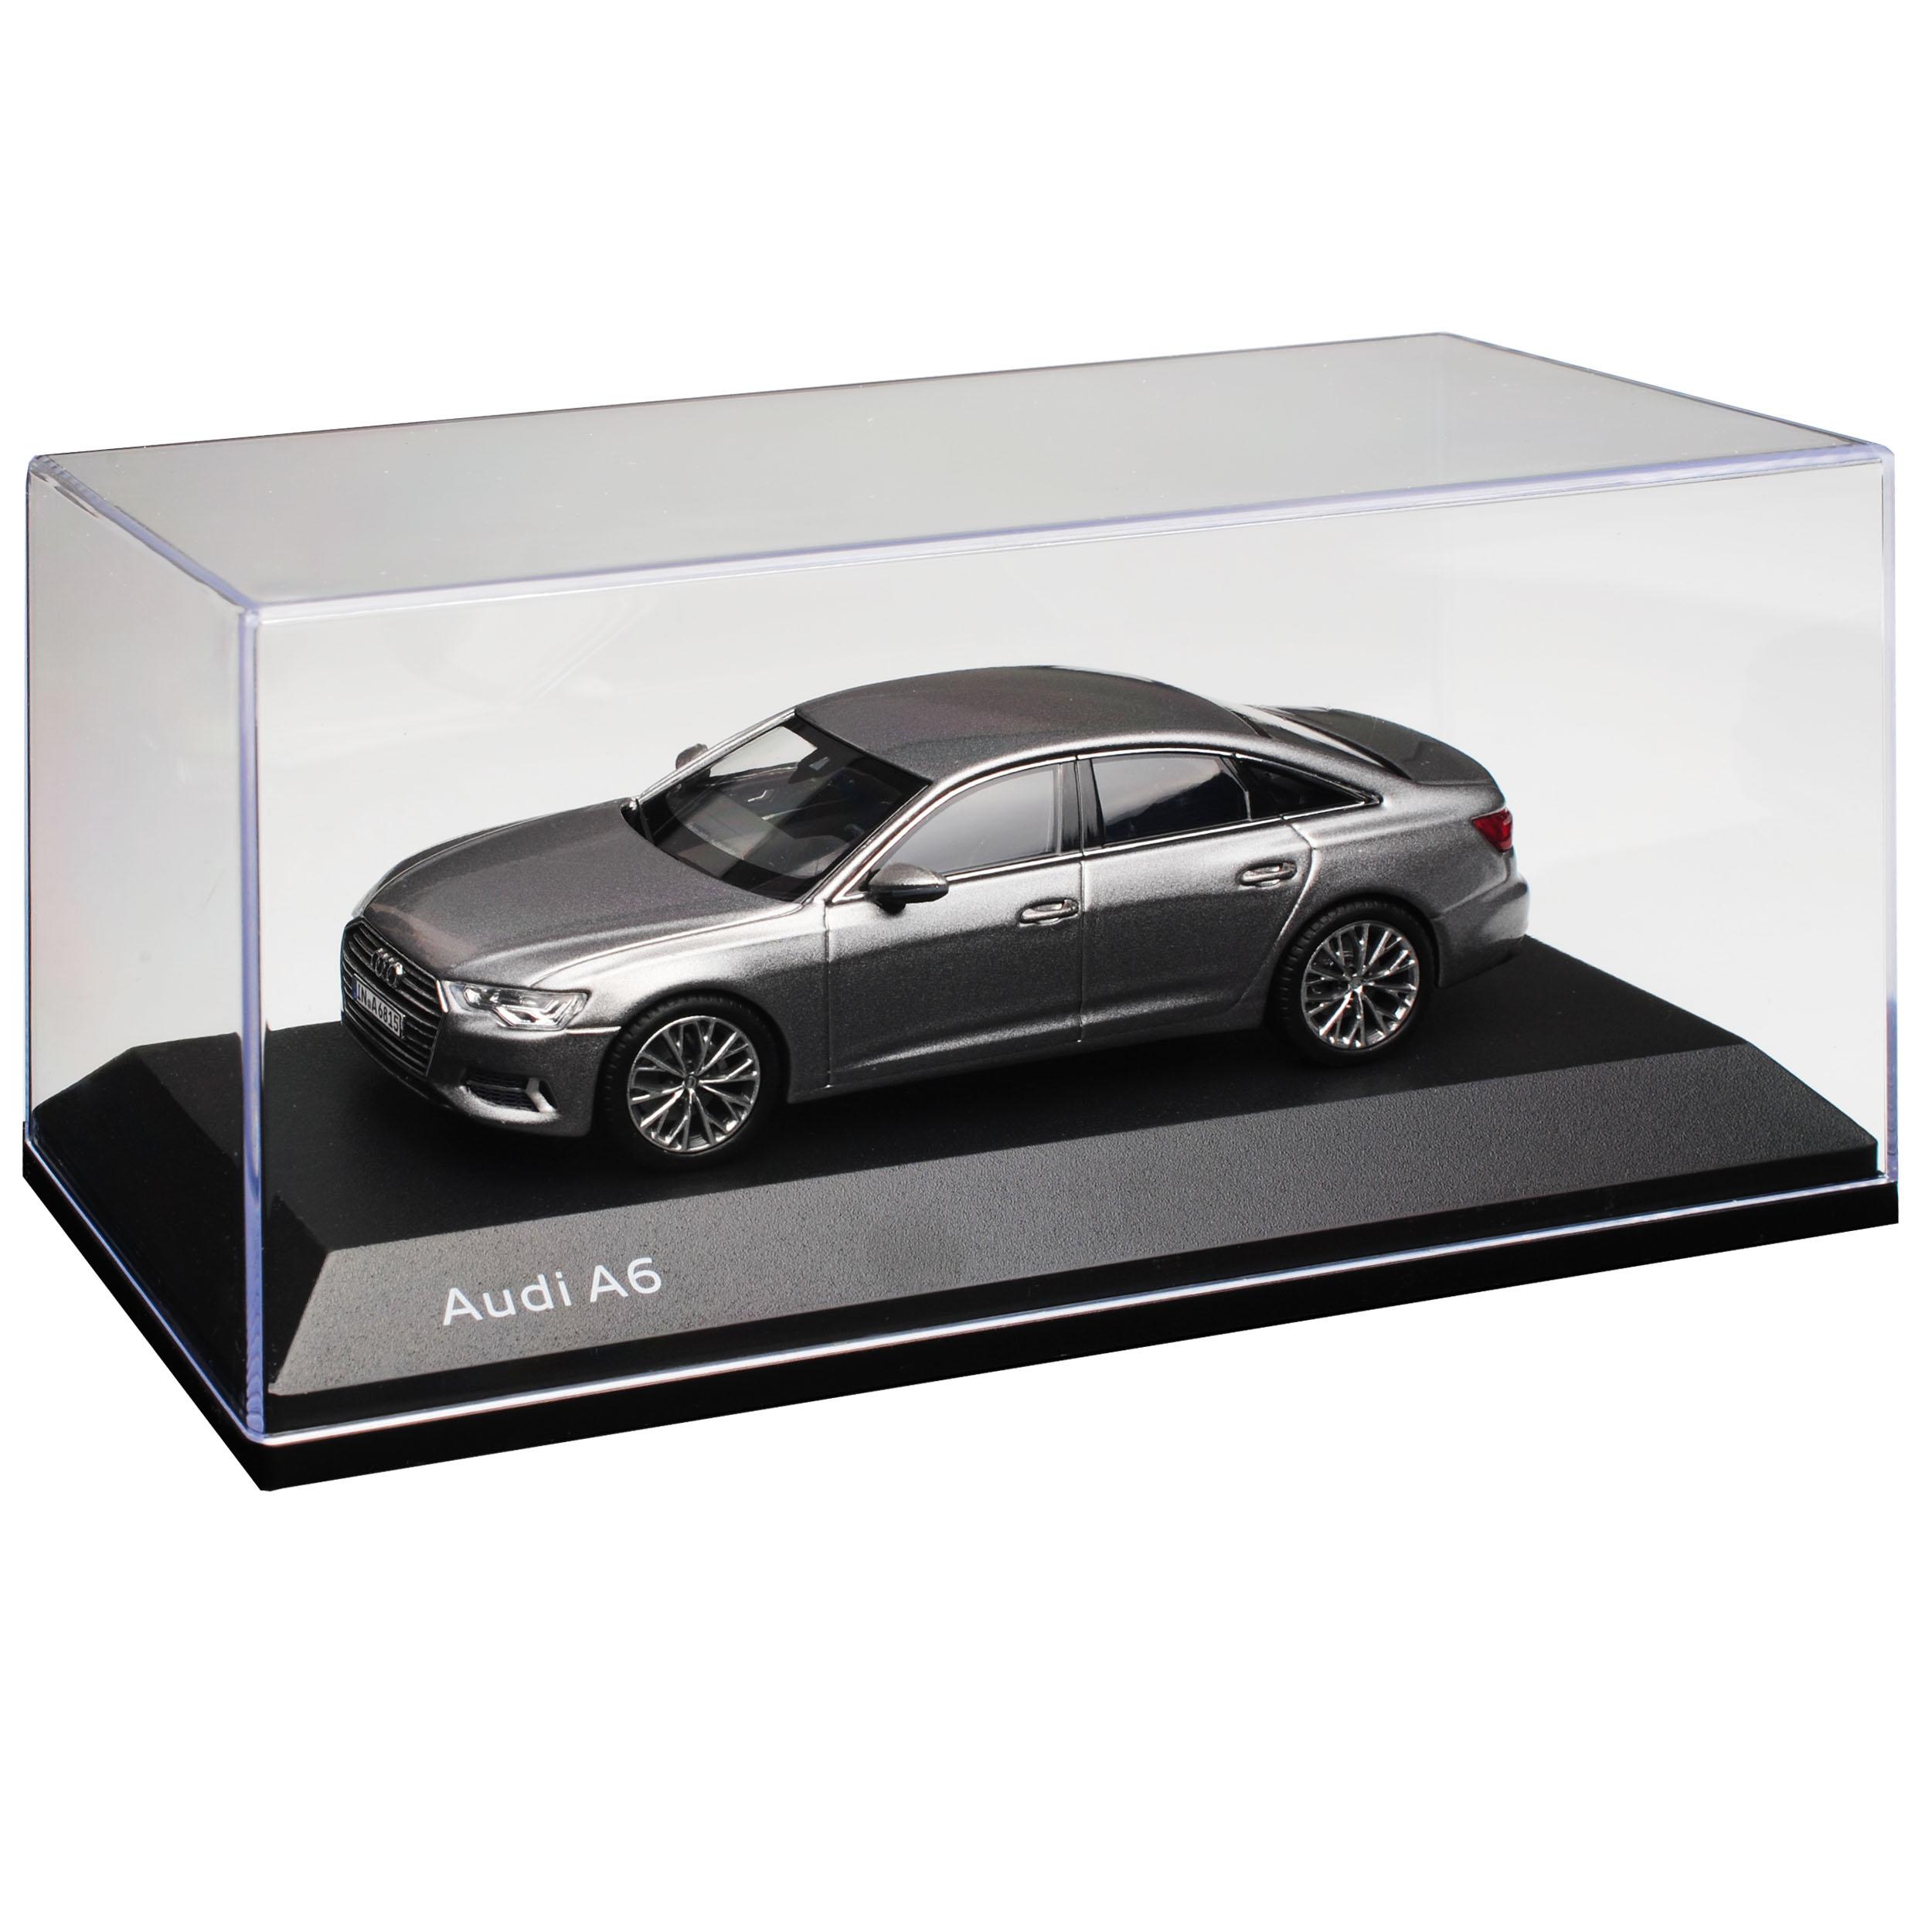 Audi A6 C8 Limousine Taifun grey Modell Ab 2018 1 1 1 43 Kyosho i-Scale Modell Aut.. 2fd617